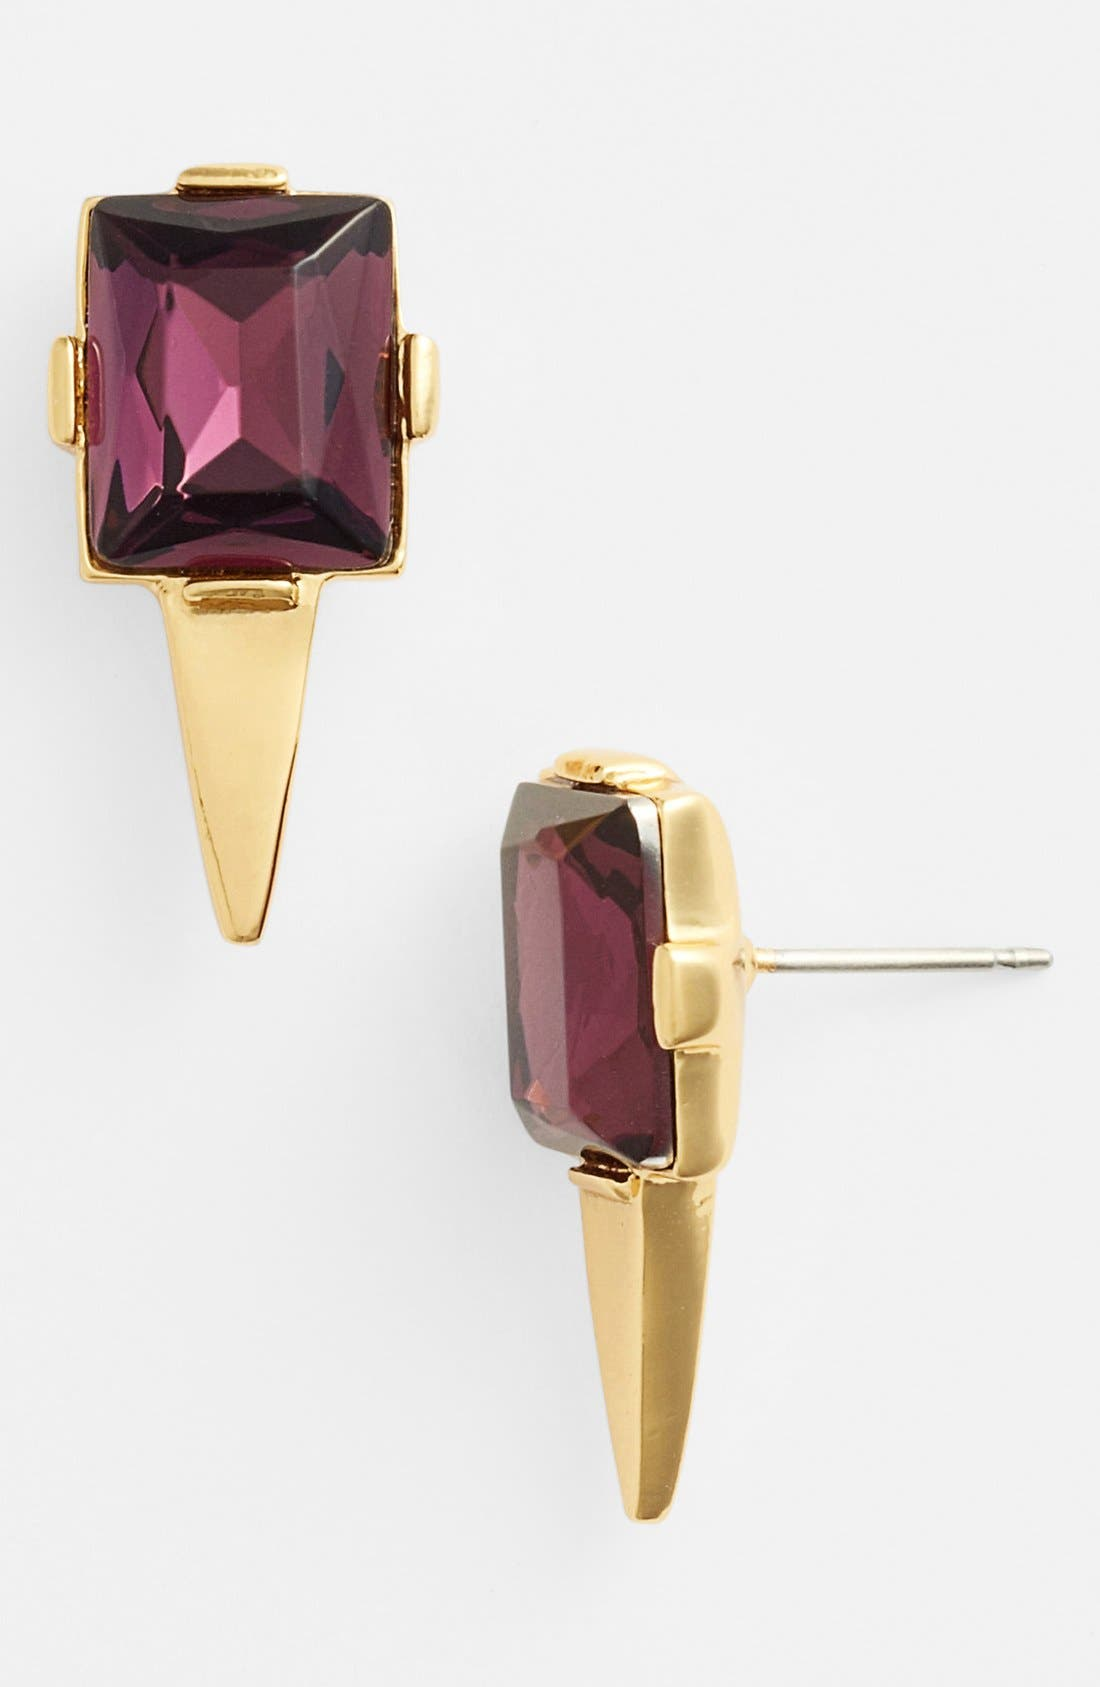 Alternate Image 1 Selected - Vince Camuto 'Rope Royalty' Stud Earrings